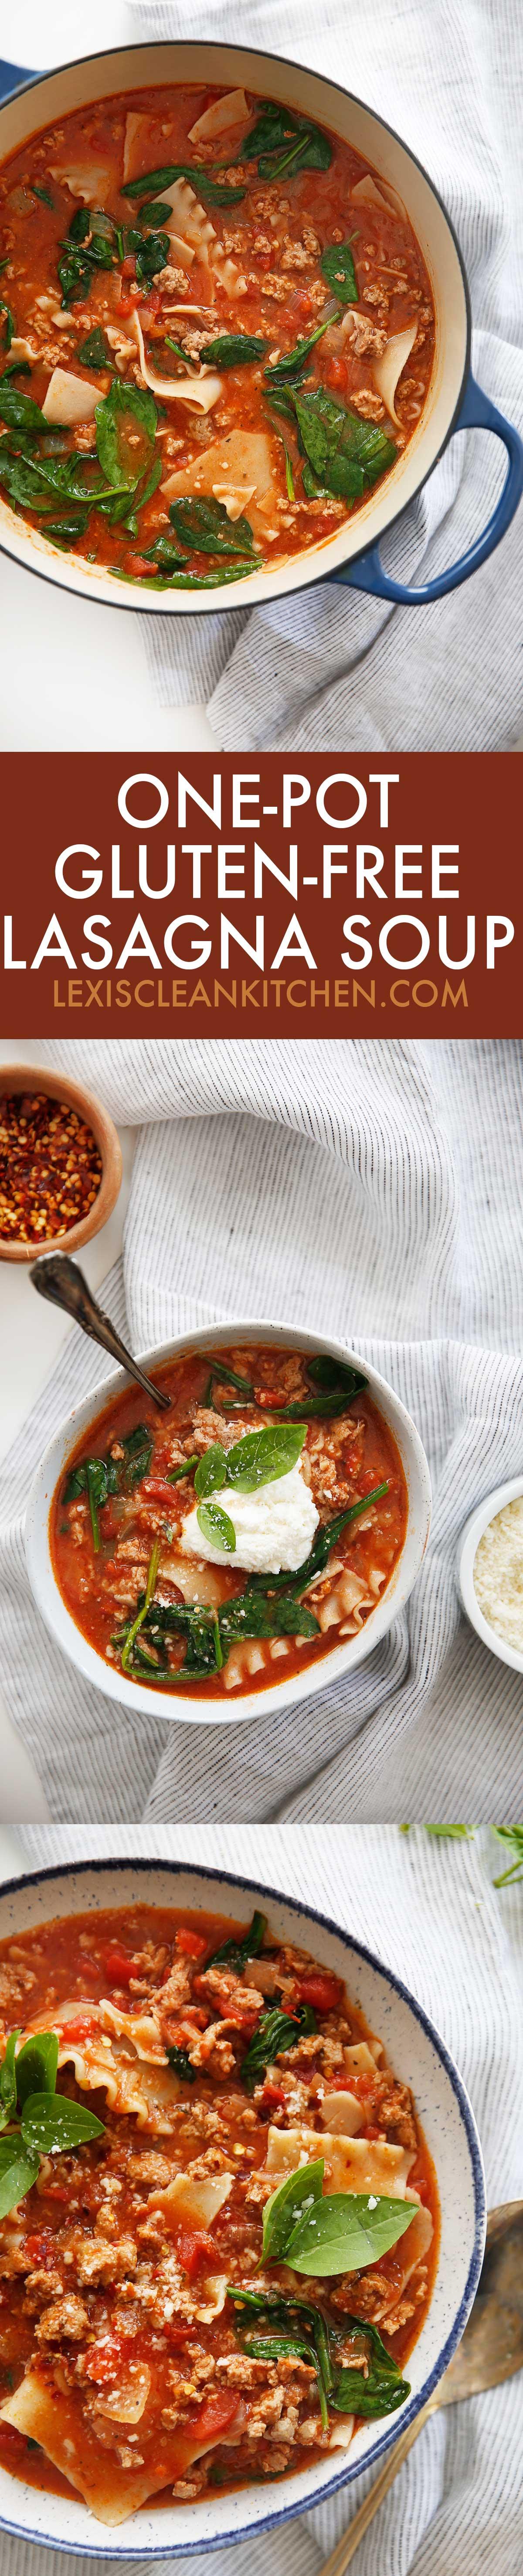 One-Pot Gluten-Free Lasagna Soup (Easy, Gluten-Free) - Lexi's Clean Kitchen #lasagna #soup #glutenfree